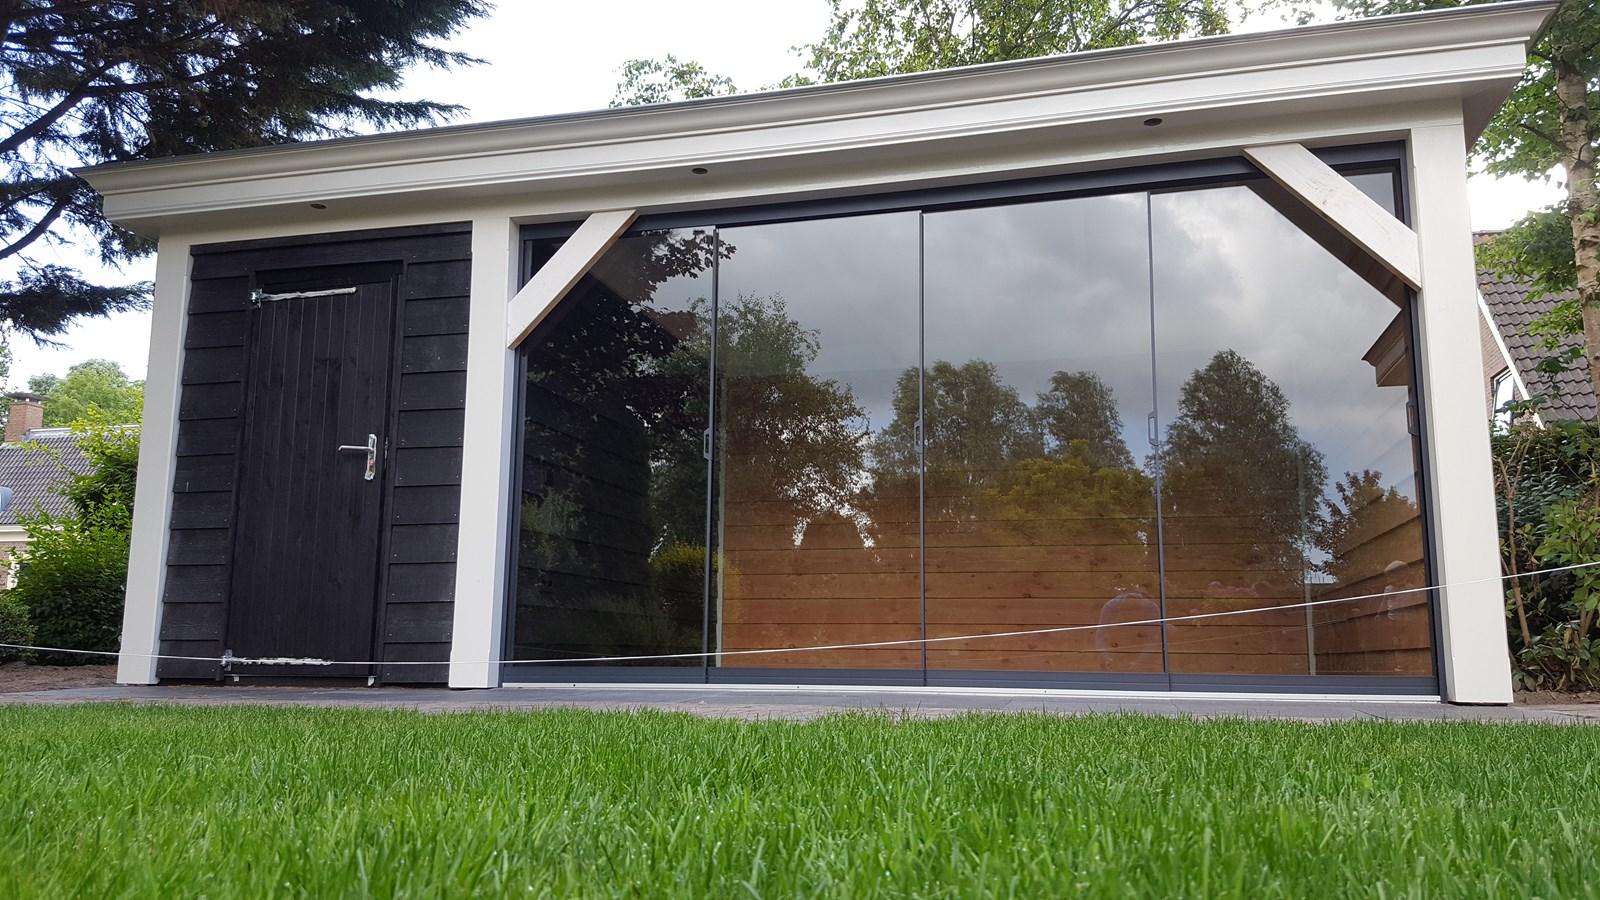 Project luxe veranda met berging for Berging met veranda